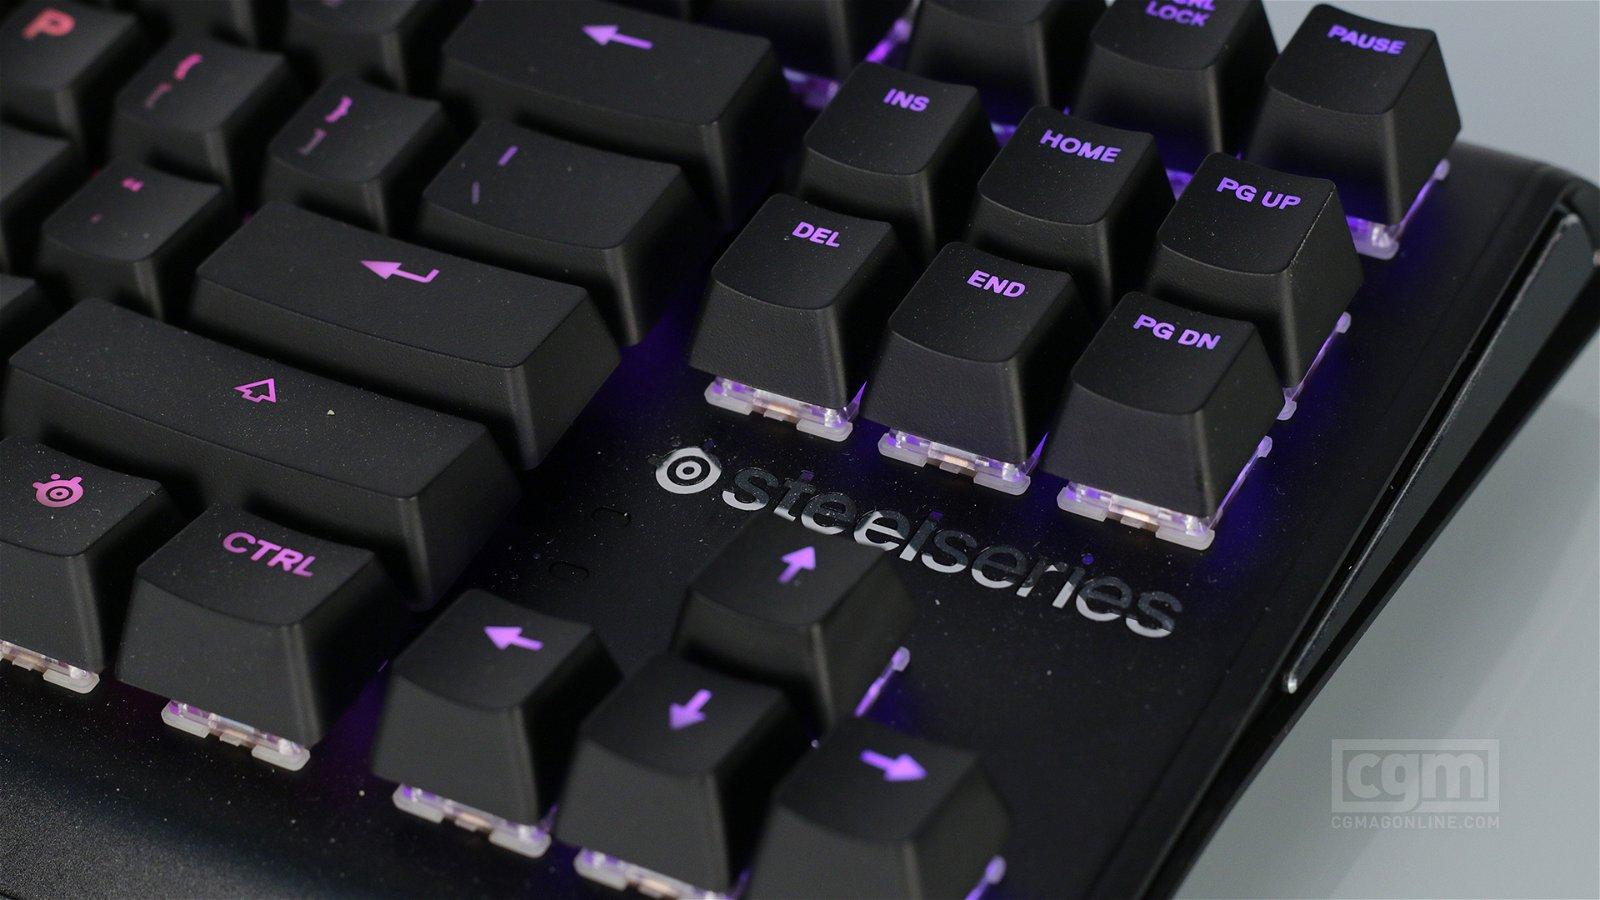 SteelSeries Apex M750 TKL (Keyboard) Mini-Review 5